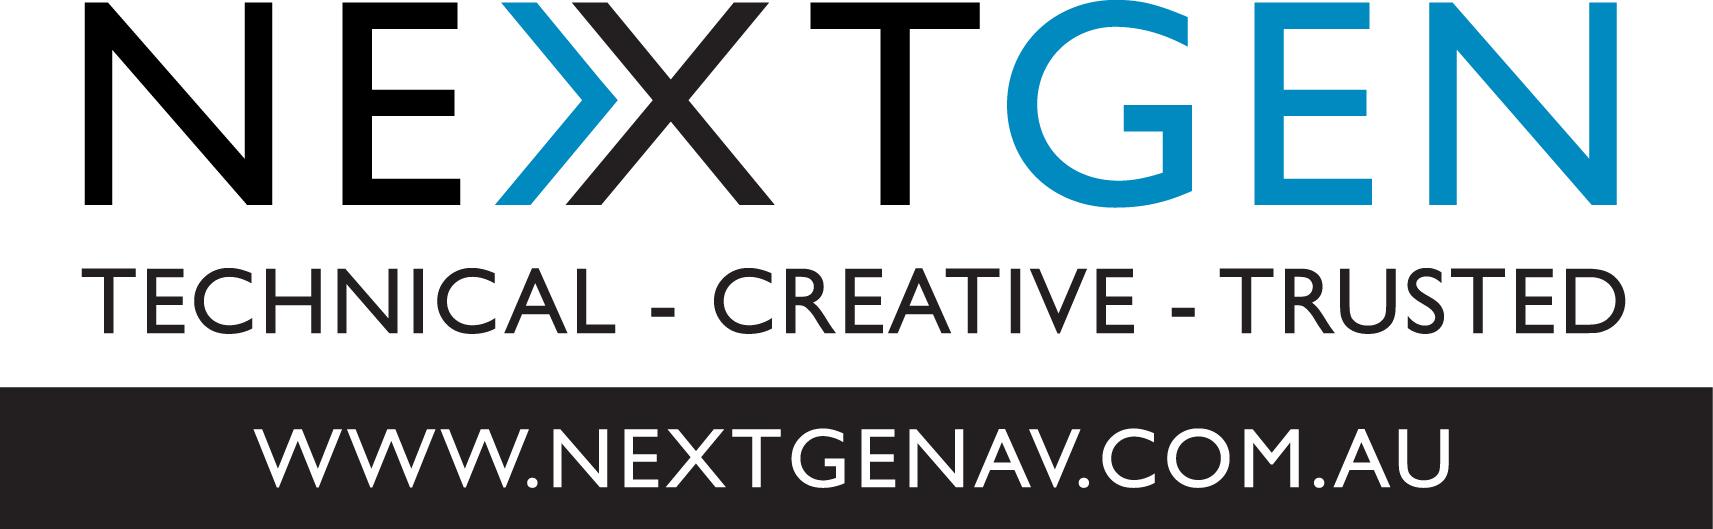 NEXTGEN Banner Logo.png